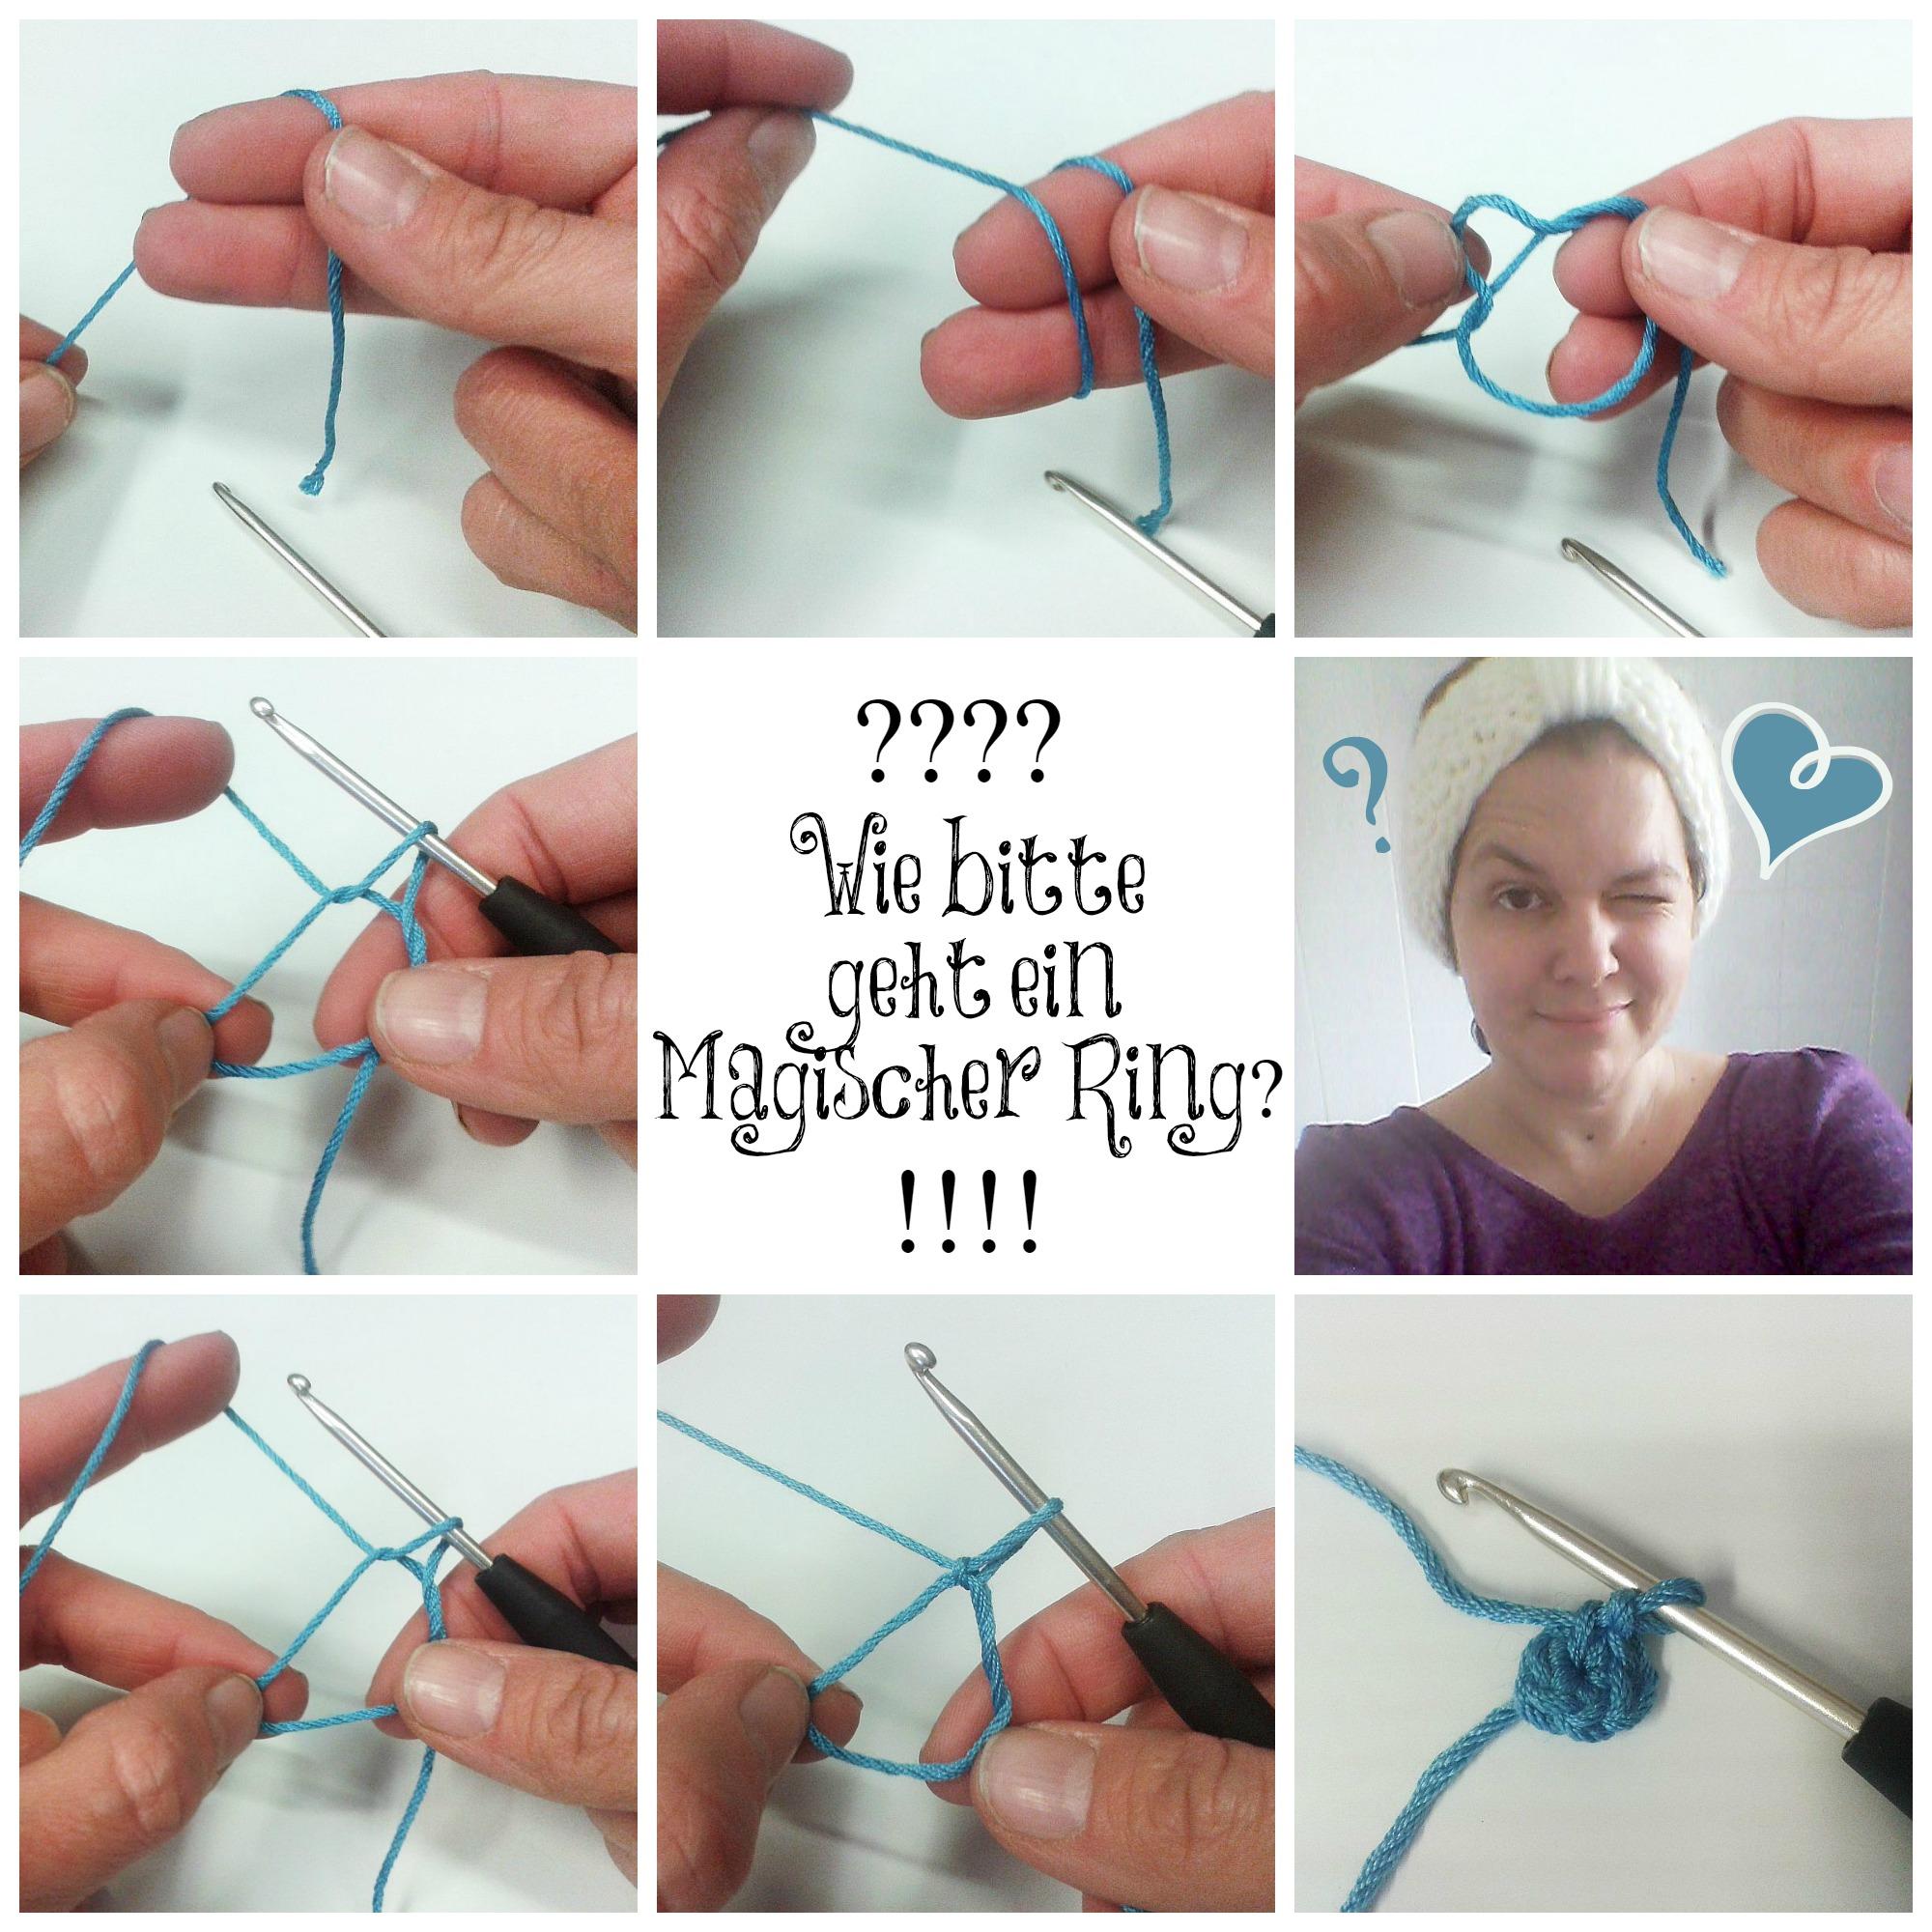 Magischer Ring Collage schoenstricken.de